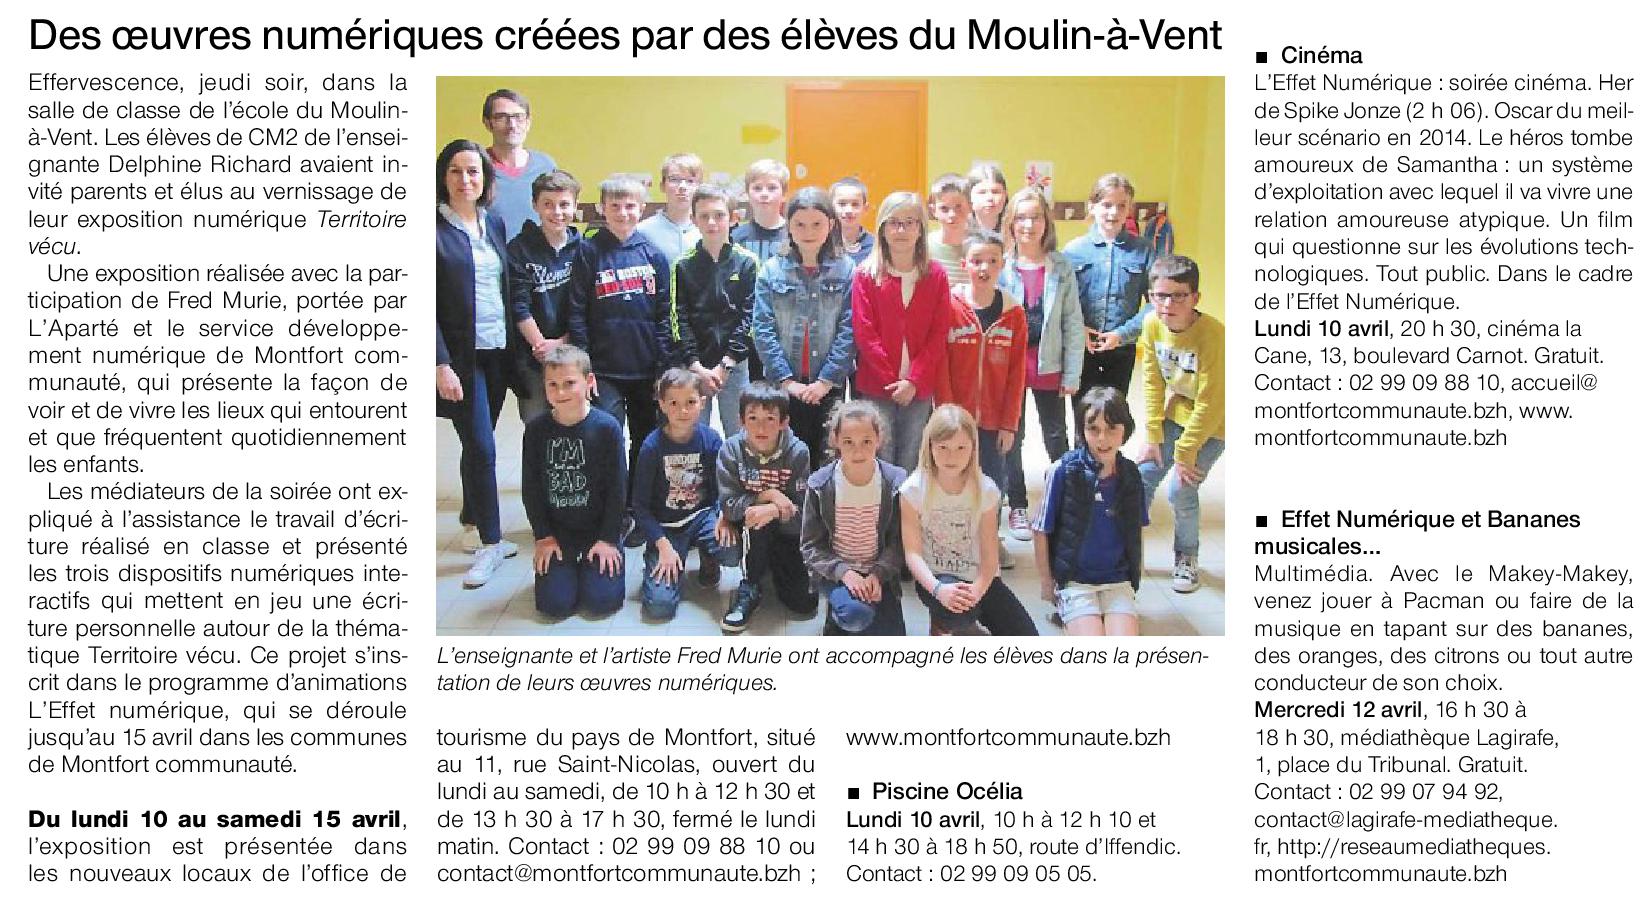 Ouest-France du lundi 10 avril 2017